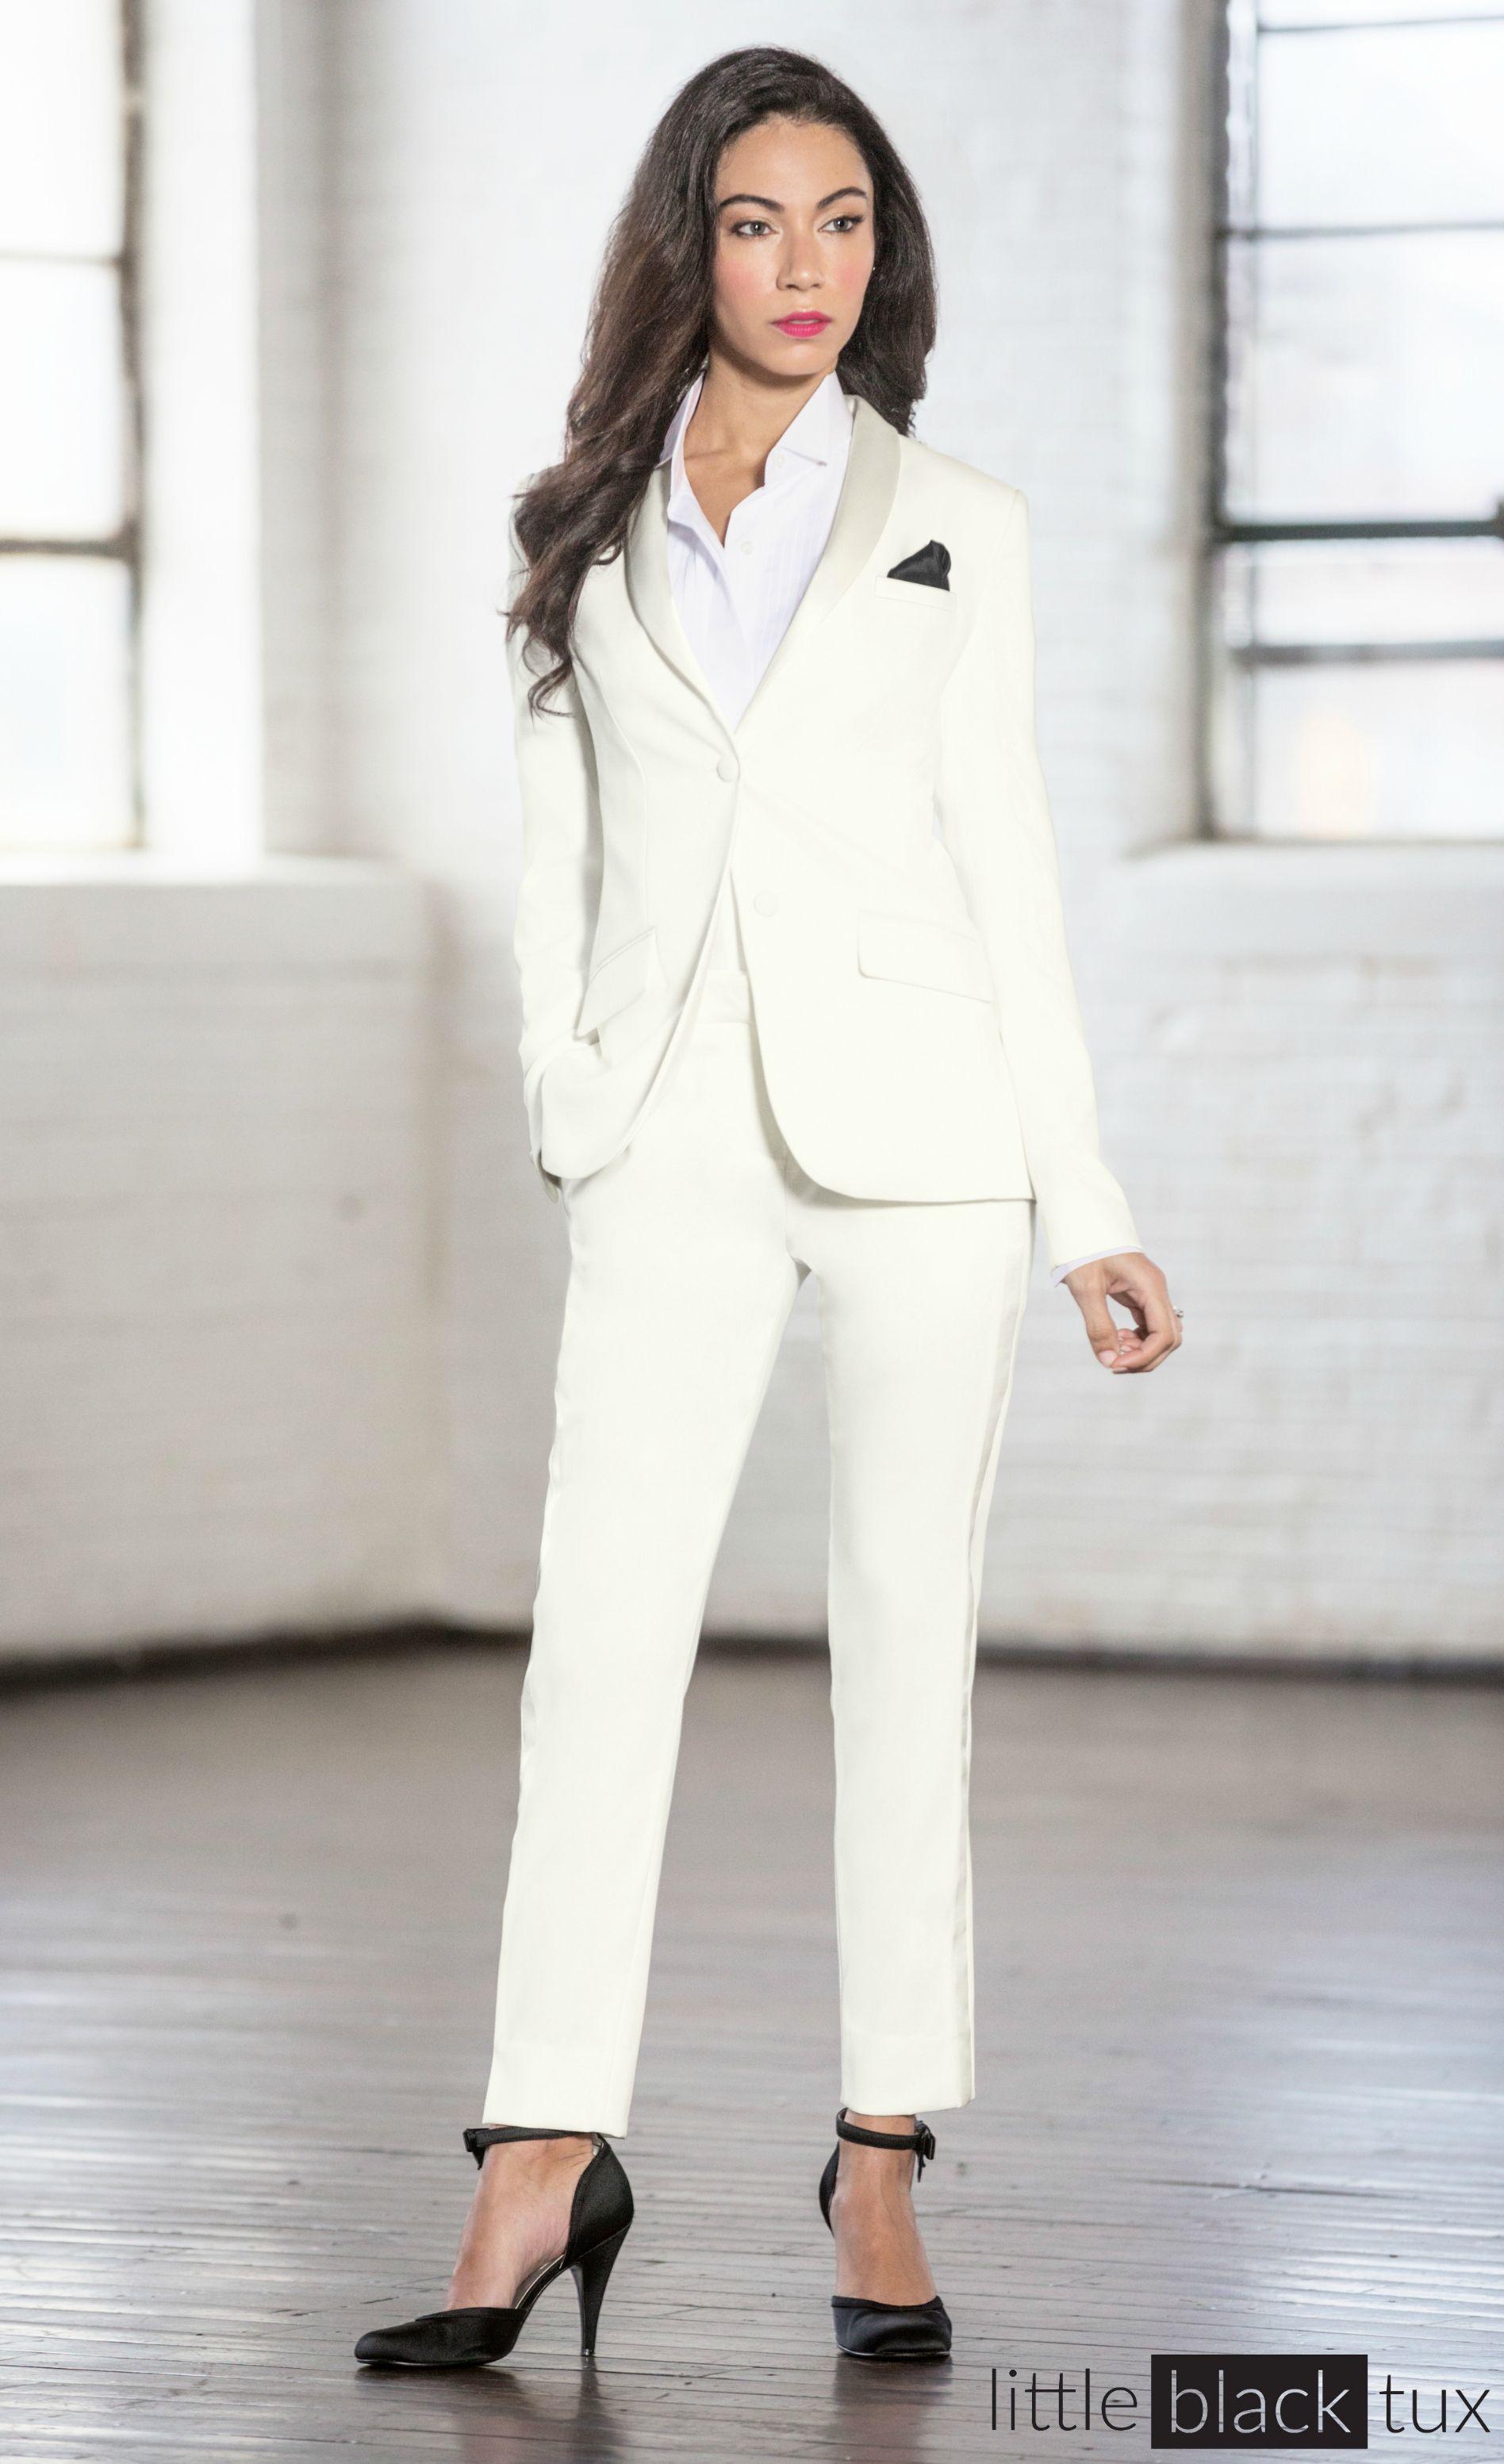 Women S Ivory Diamond White Tuxedo Ladytux Shawl Collar Slim Fit Belt Loops Satin Lapel Female Tux Tuxedo Women Women Suits Wedding White Tuxedo Wedding [ 3106 x 1896 Pixel ]